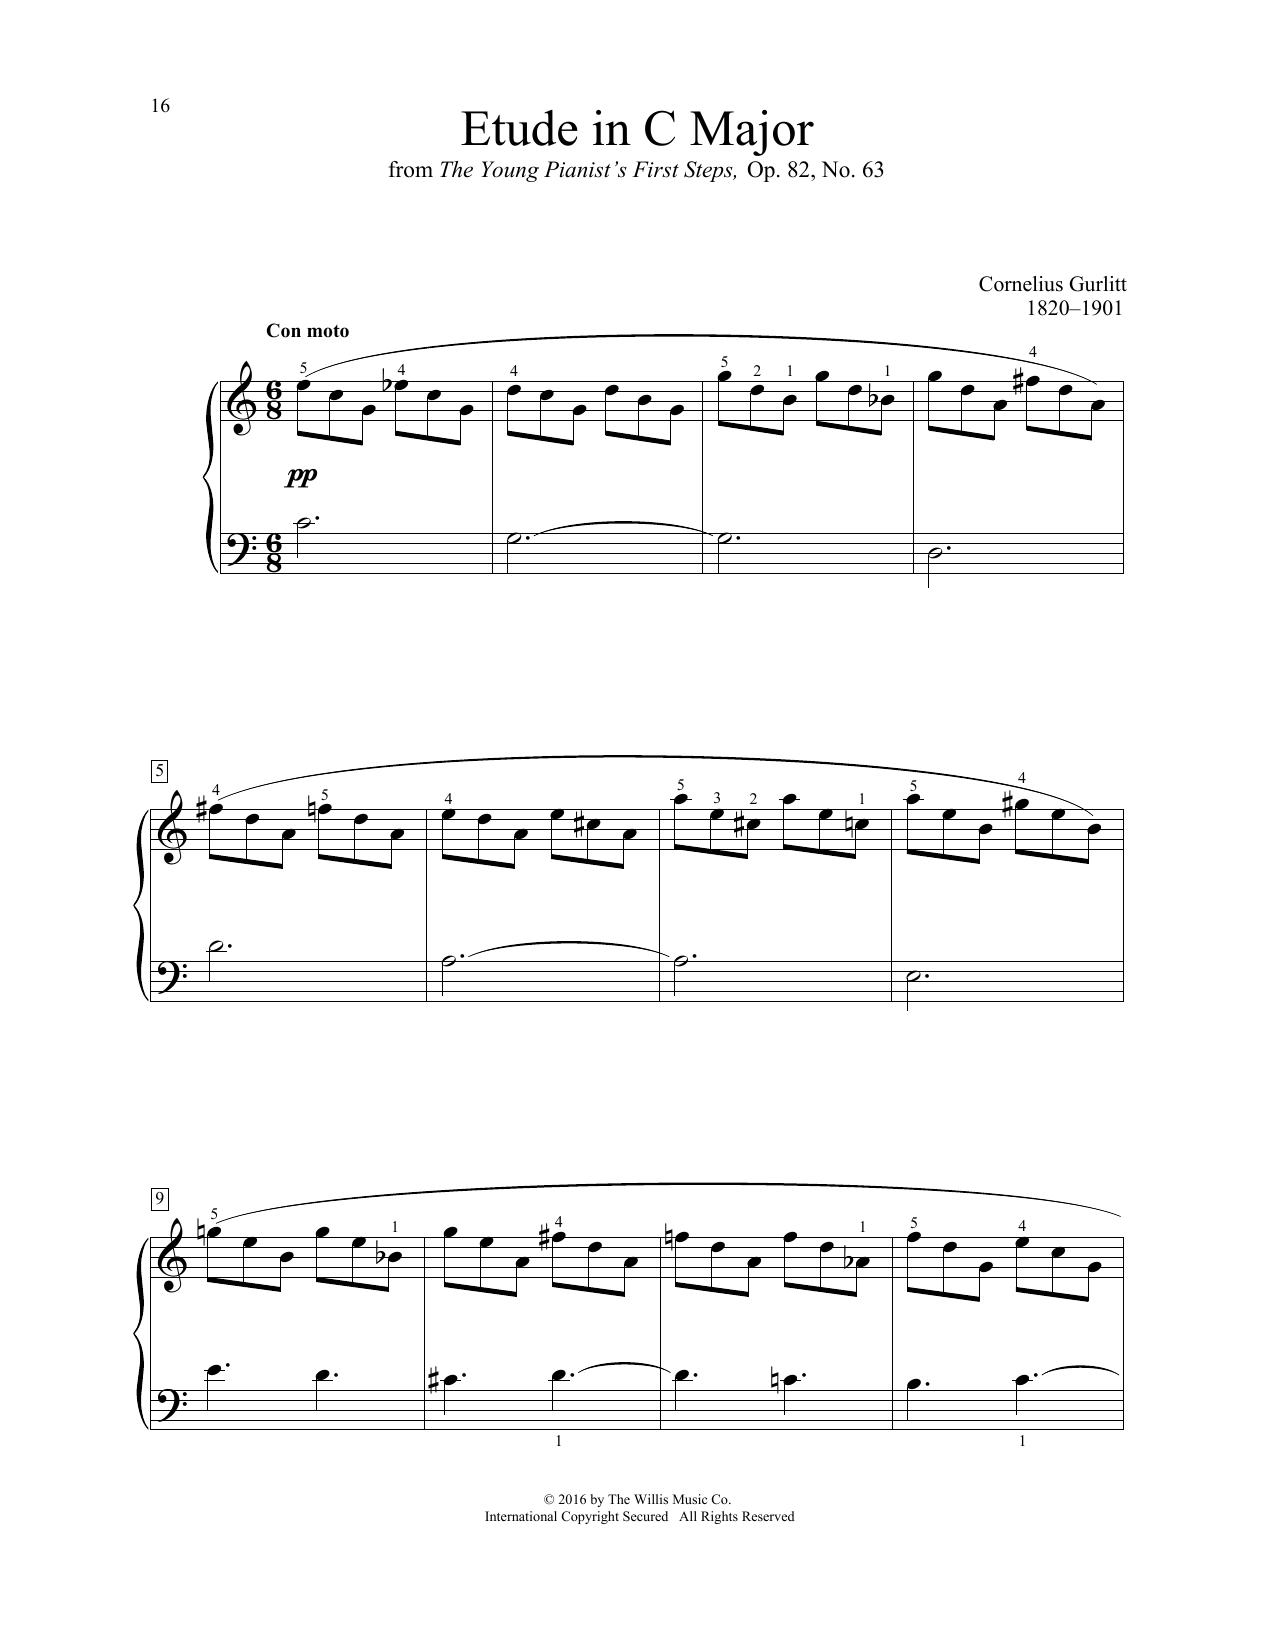 Cornelius Gurlitt Etude In C Major sheet music notes and chords. Download Printable PDF.